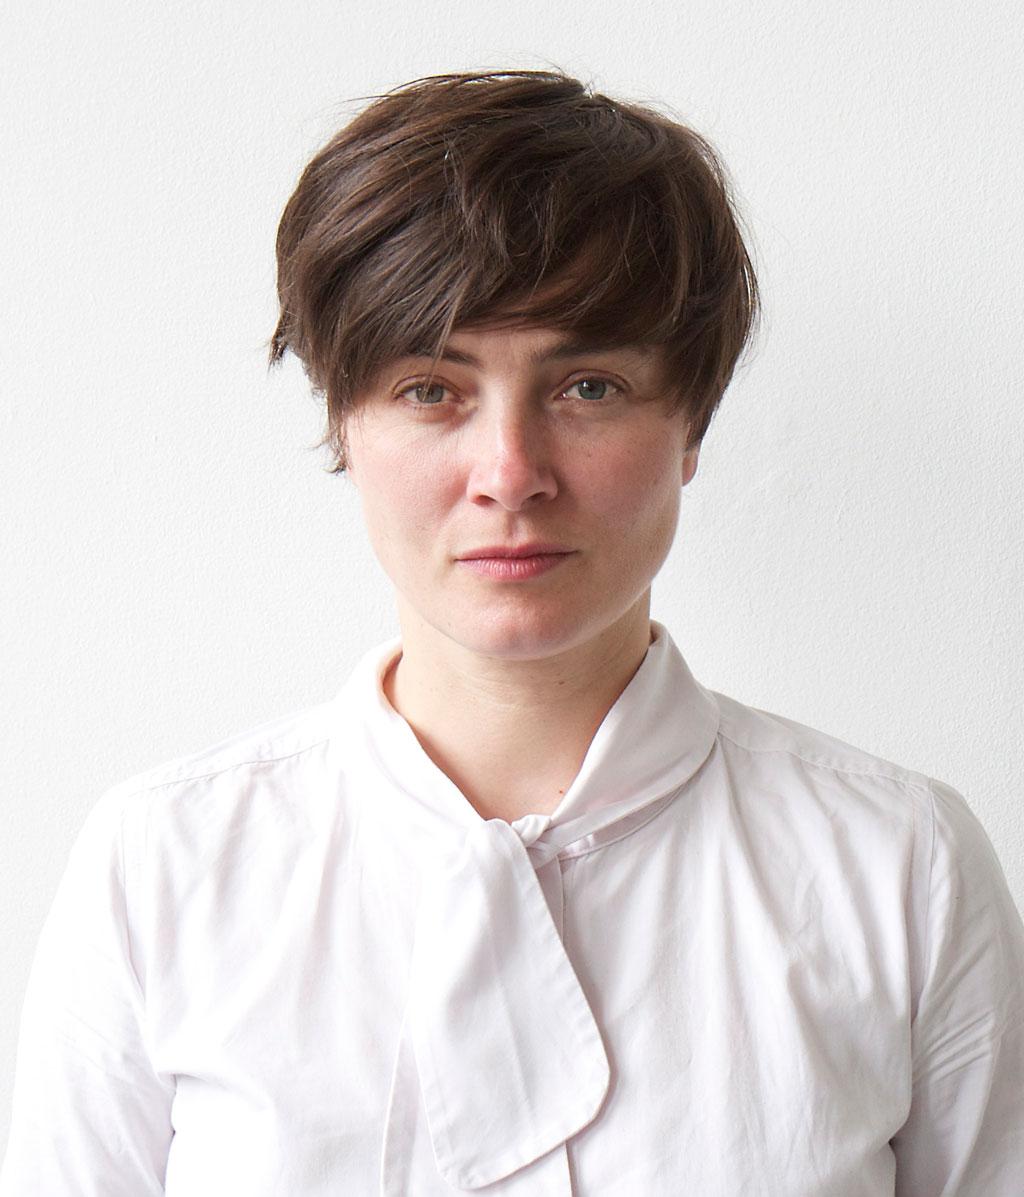 Eventbild für Paloma Varga Weisz, Künstlerin, Düsseldorf